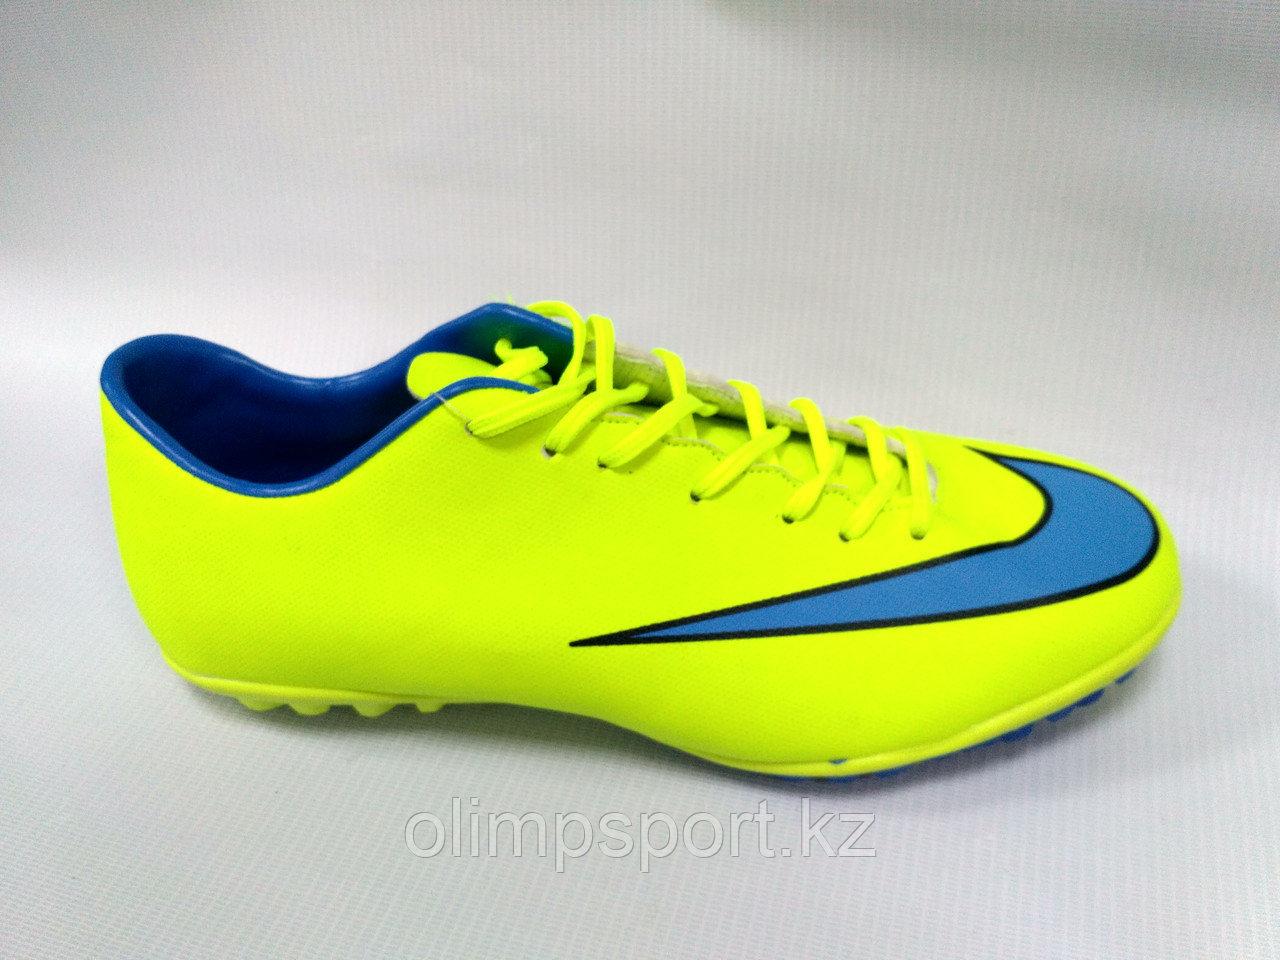 Обувь для футбола, шиповки, сороконожки  Nike Mercurial